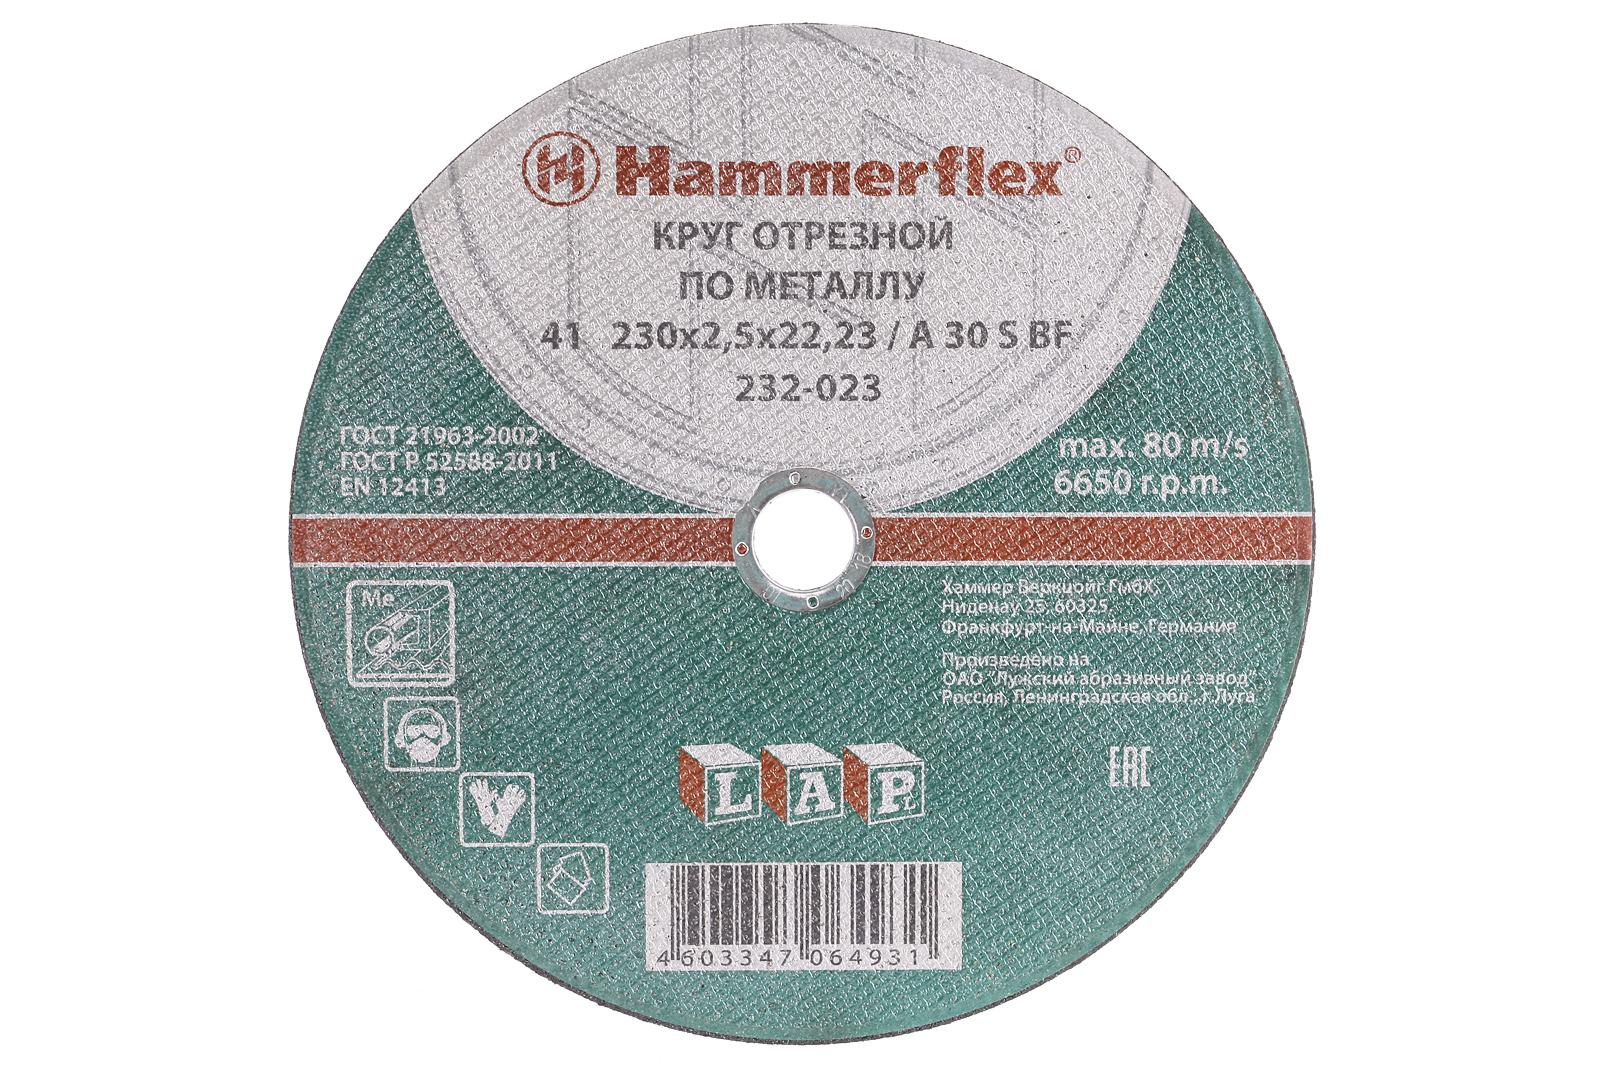 Круг отрезной Hammer Flex 230 x 2.5 x 22 по металлу 25шт круг отрезной hammer 150 x 2 0 x 22 по металлу коробка 200шт